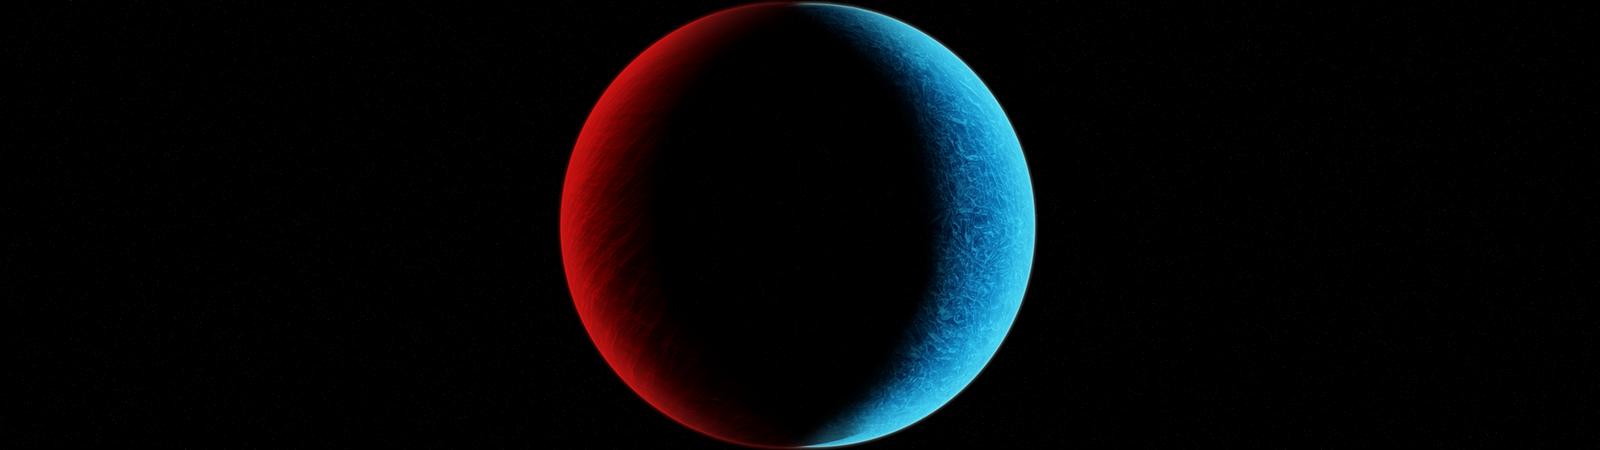 dual monitor wallpaper planets ver 1 by breezyxox on